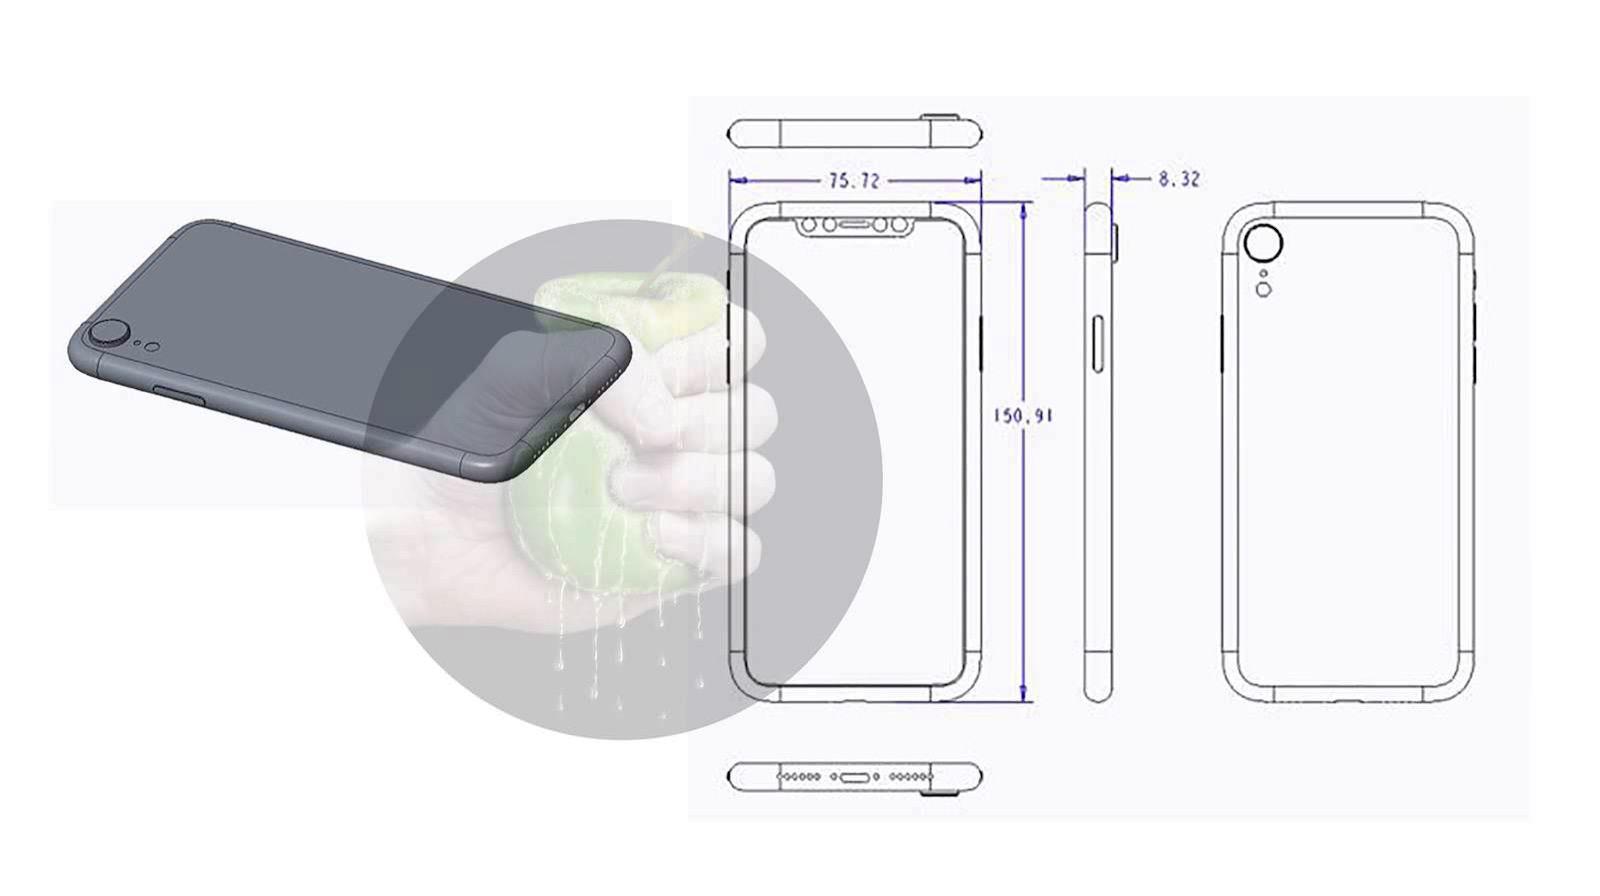 iPhone-9-wylsacom-5.jpg